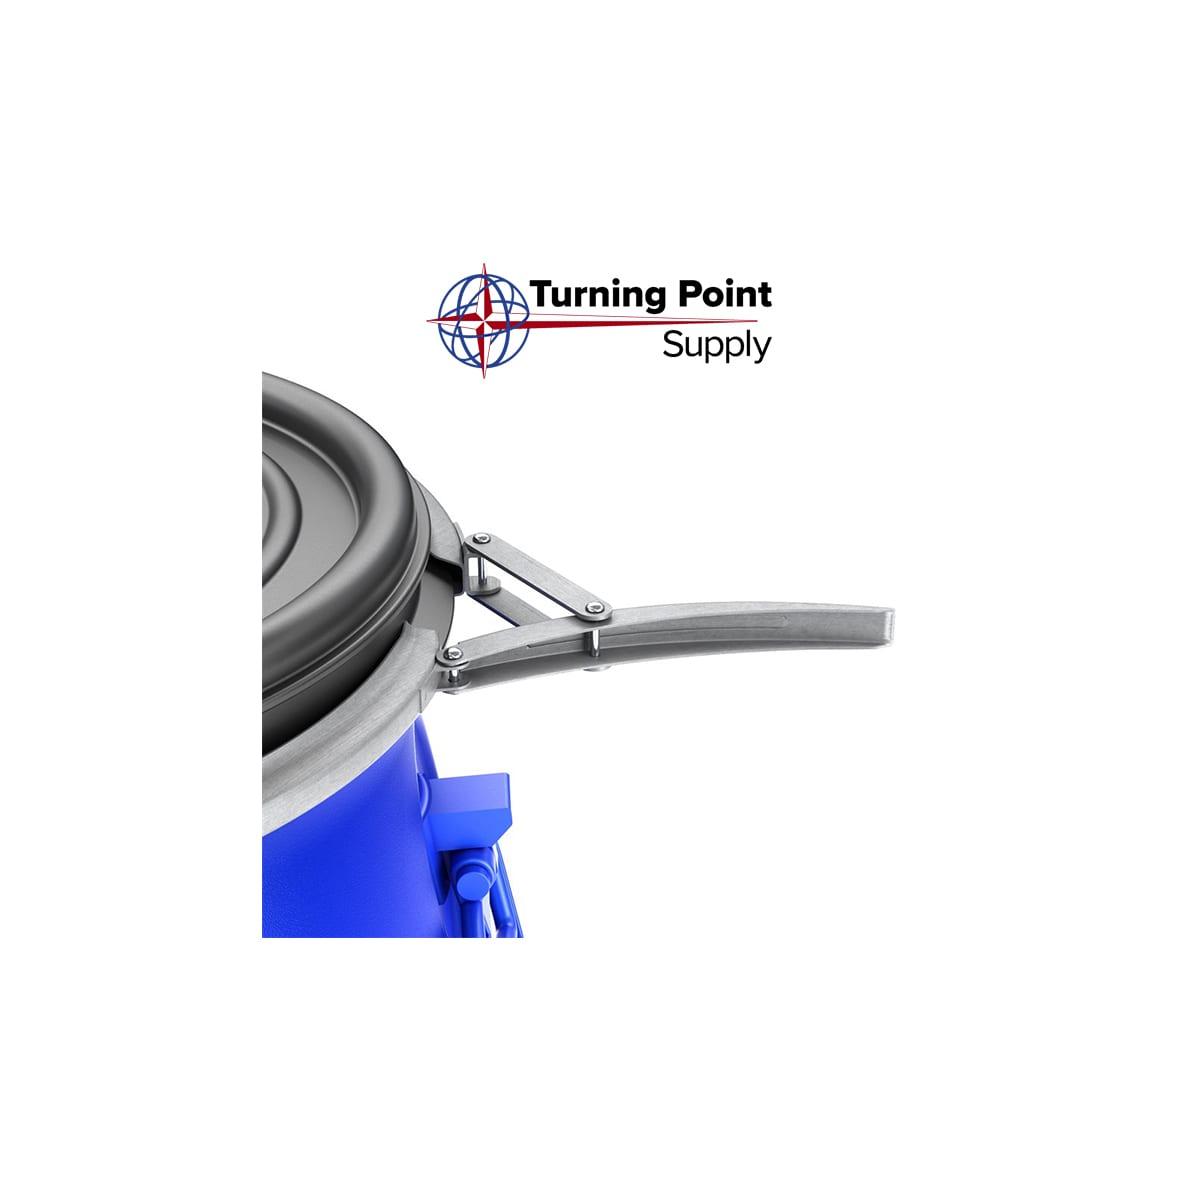 Locking Lid MIXING BARREL -15 GALLON PLASTIC by Bon Tools - 22-816